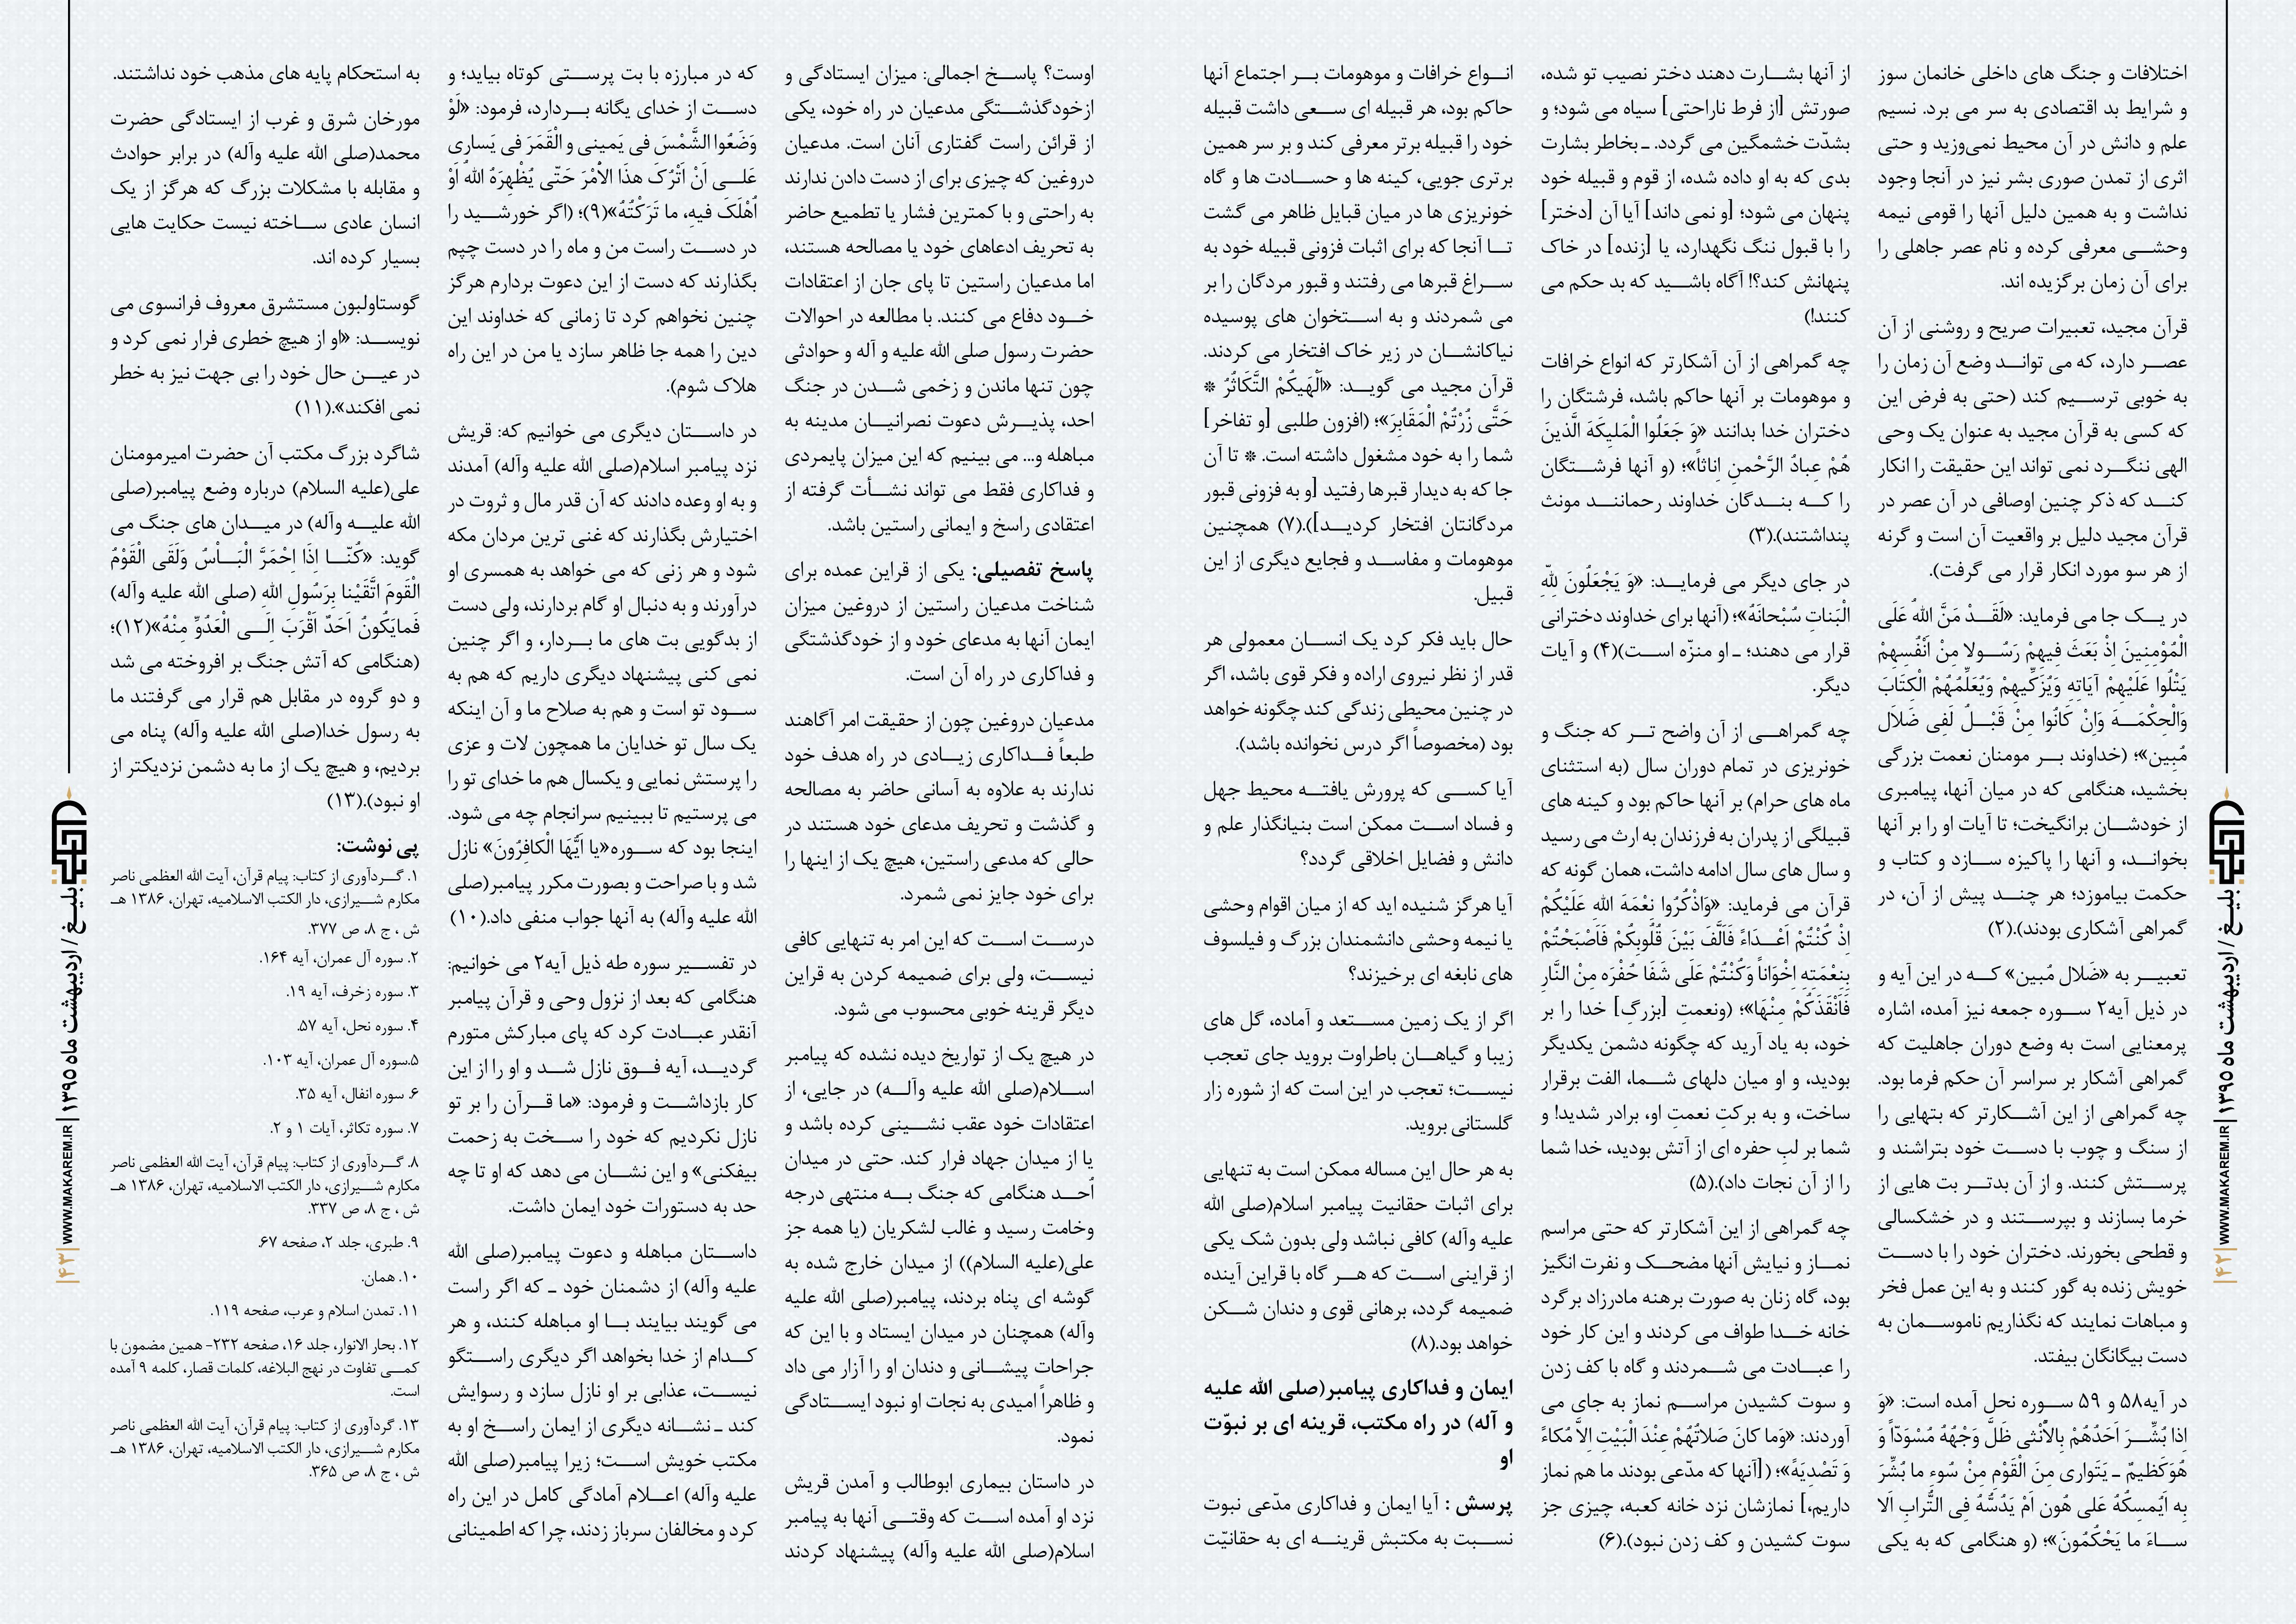 22-مدرسه الامام امیر المومنین (ع)